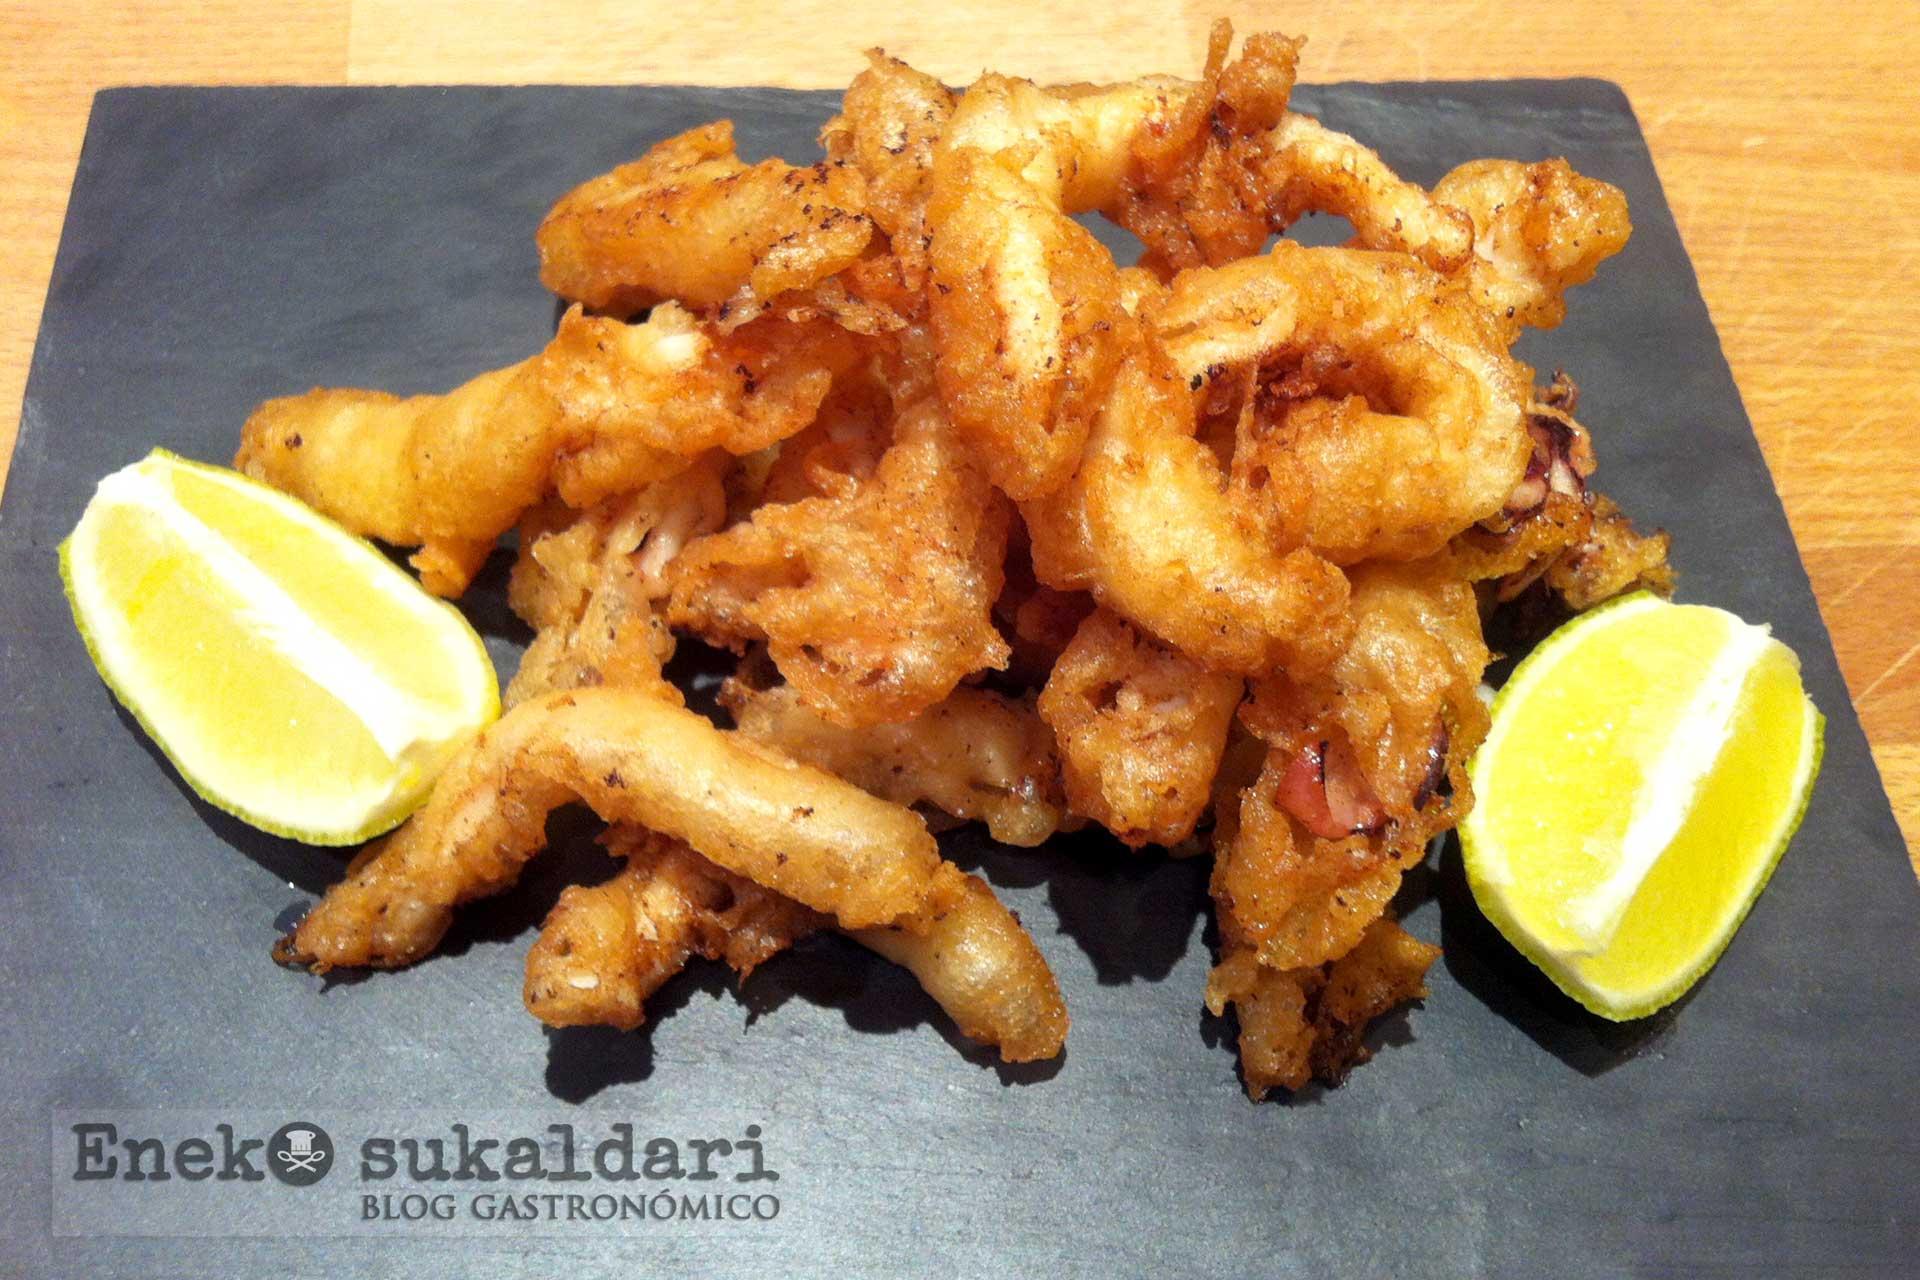 Rabas caseras de calamar - Receta paso a paso - Eneko sukaldari blog gastronómico